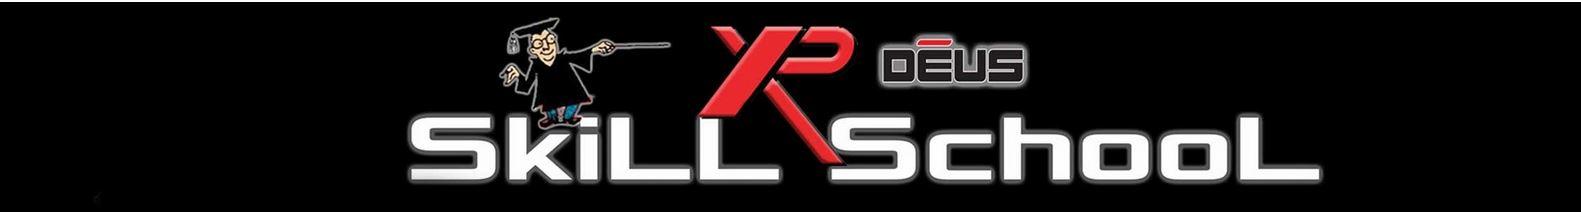 XP Deus Skill School | The best way to learn metal detecting is by watching videos